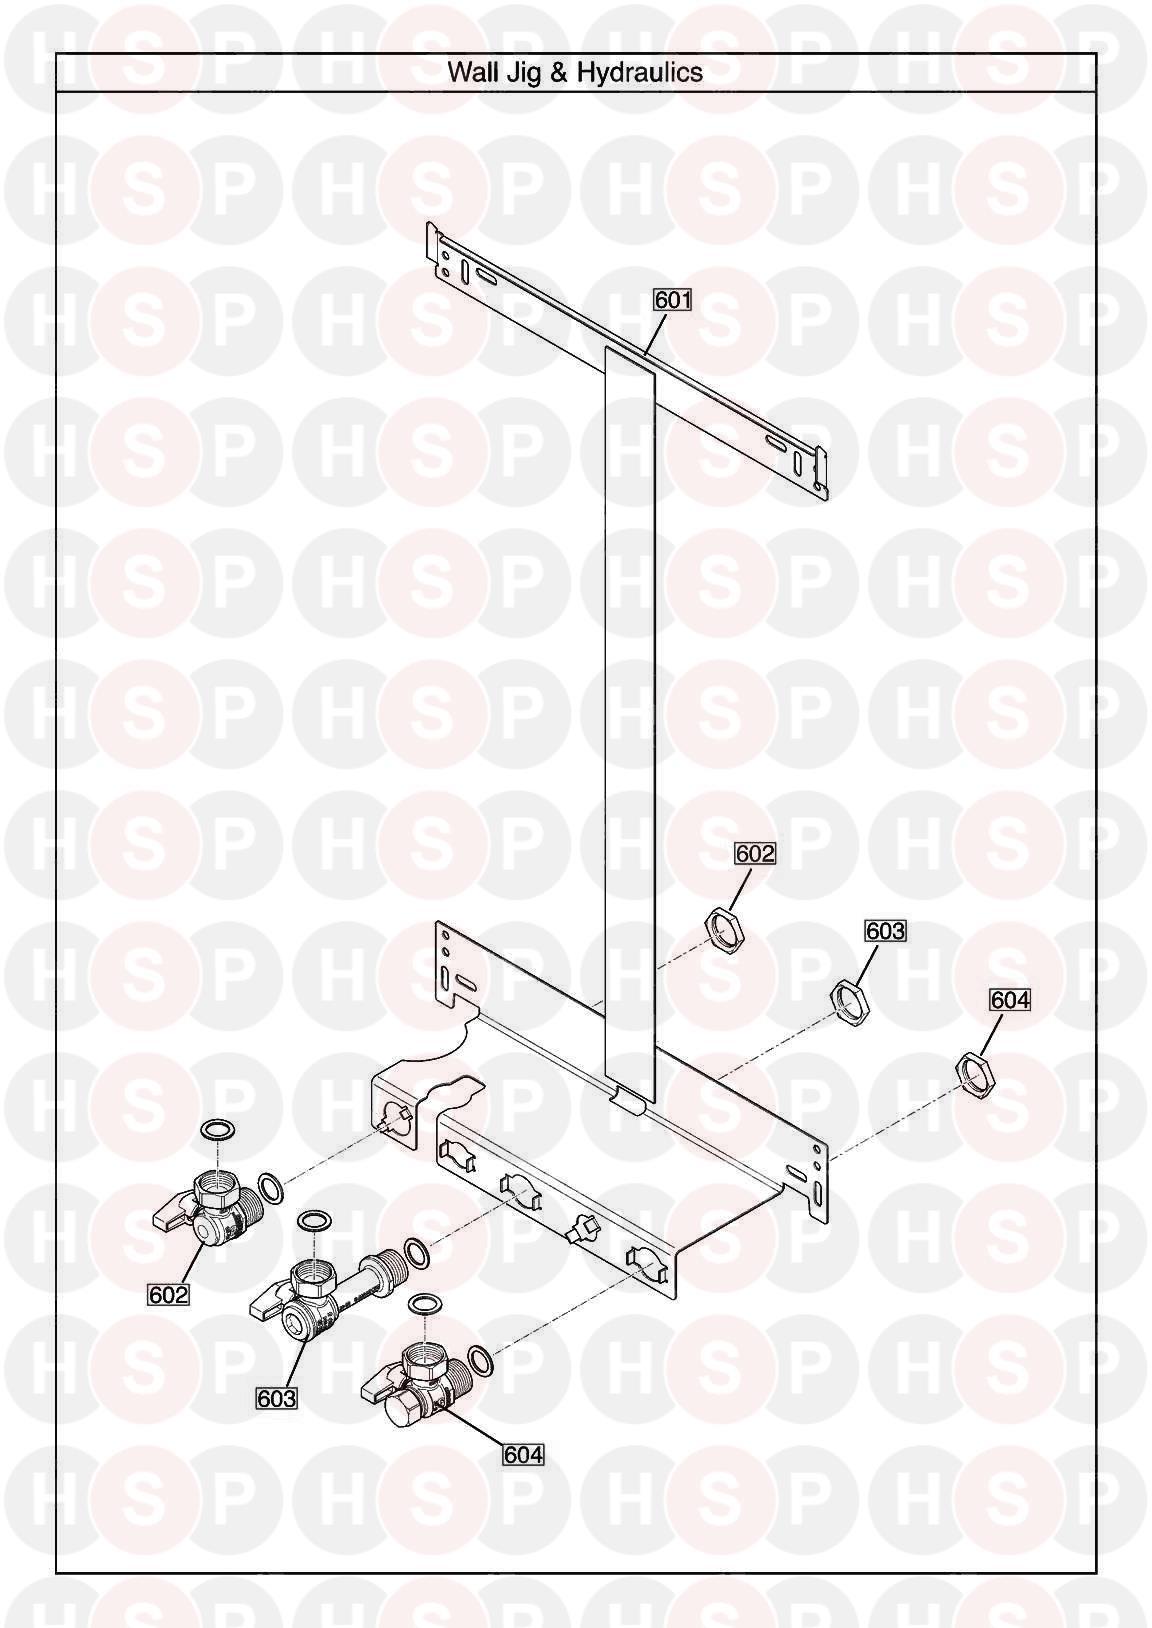 baxi megaflo 2 system 32 compact ga appliance diagram